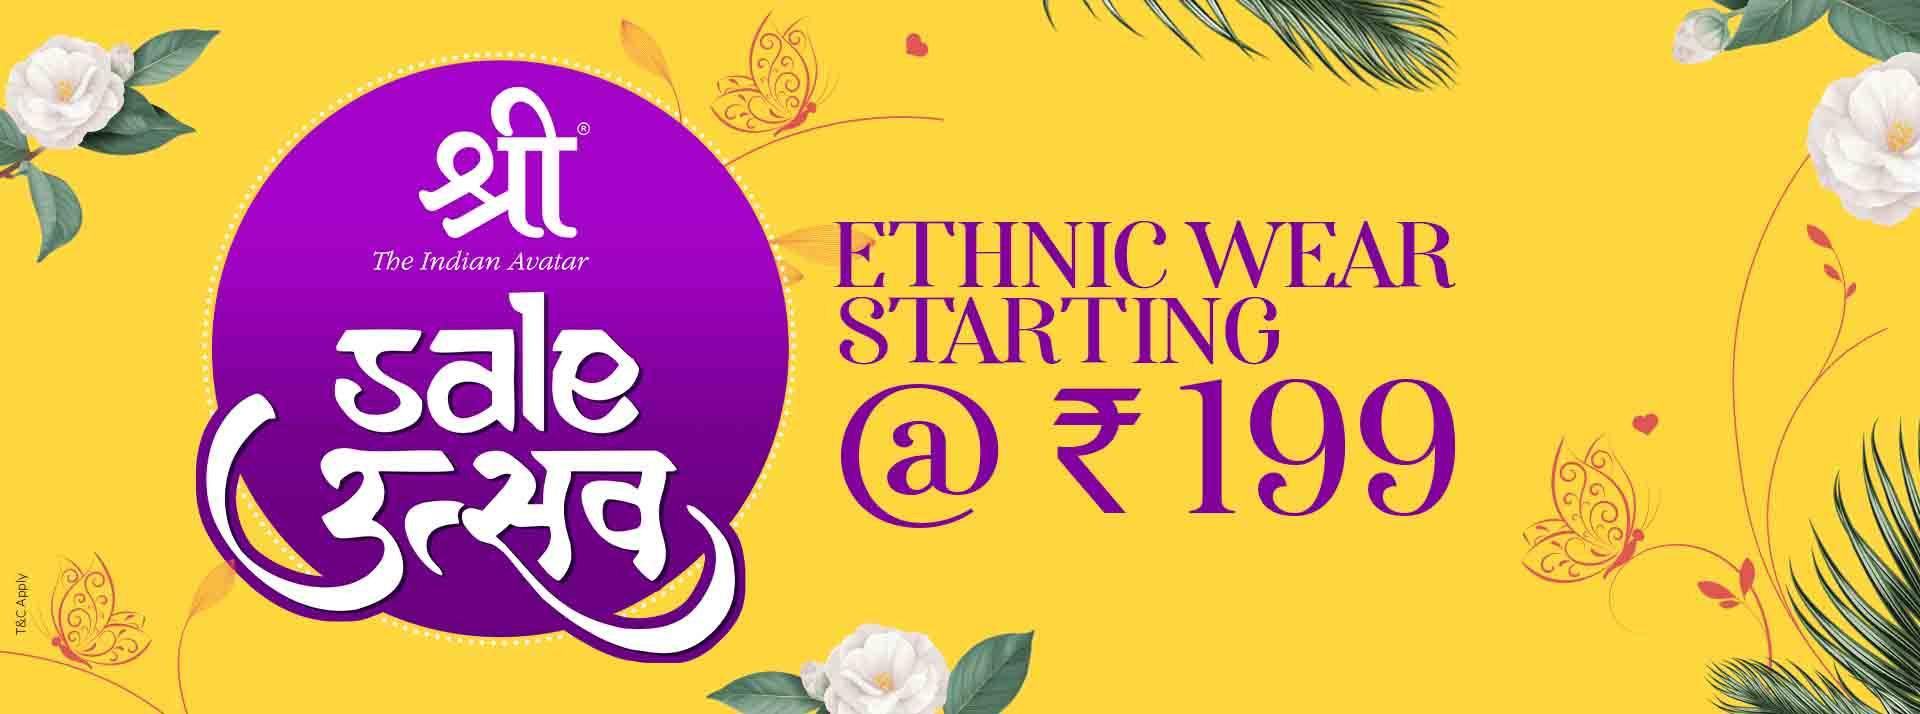 Ethnic Wear Starts @ 199